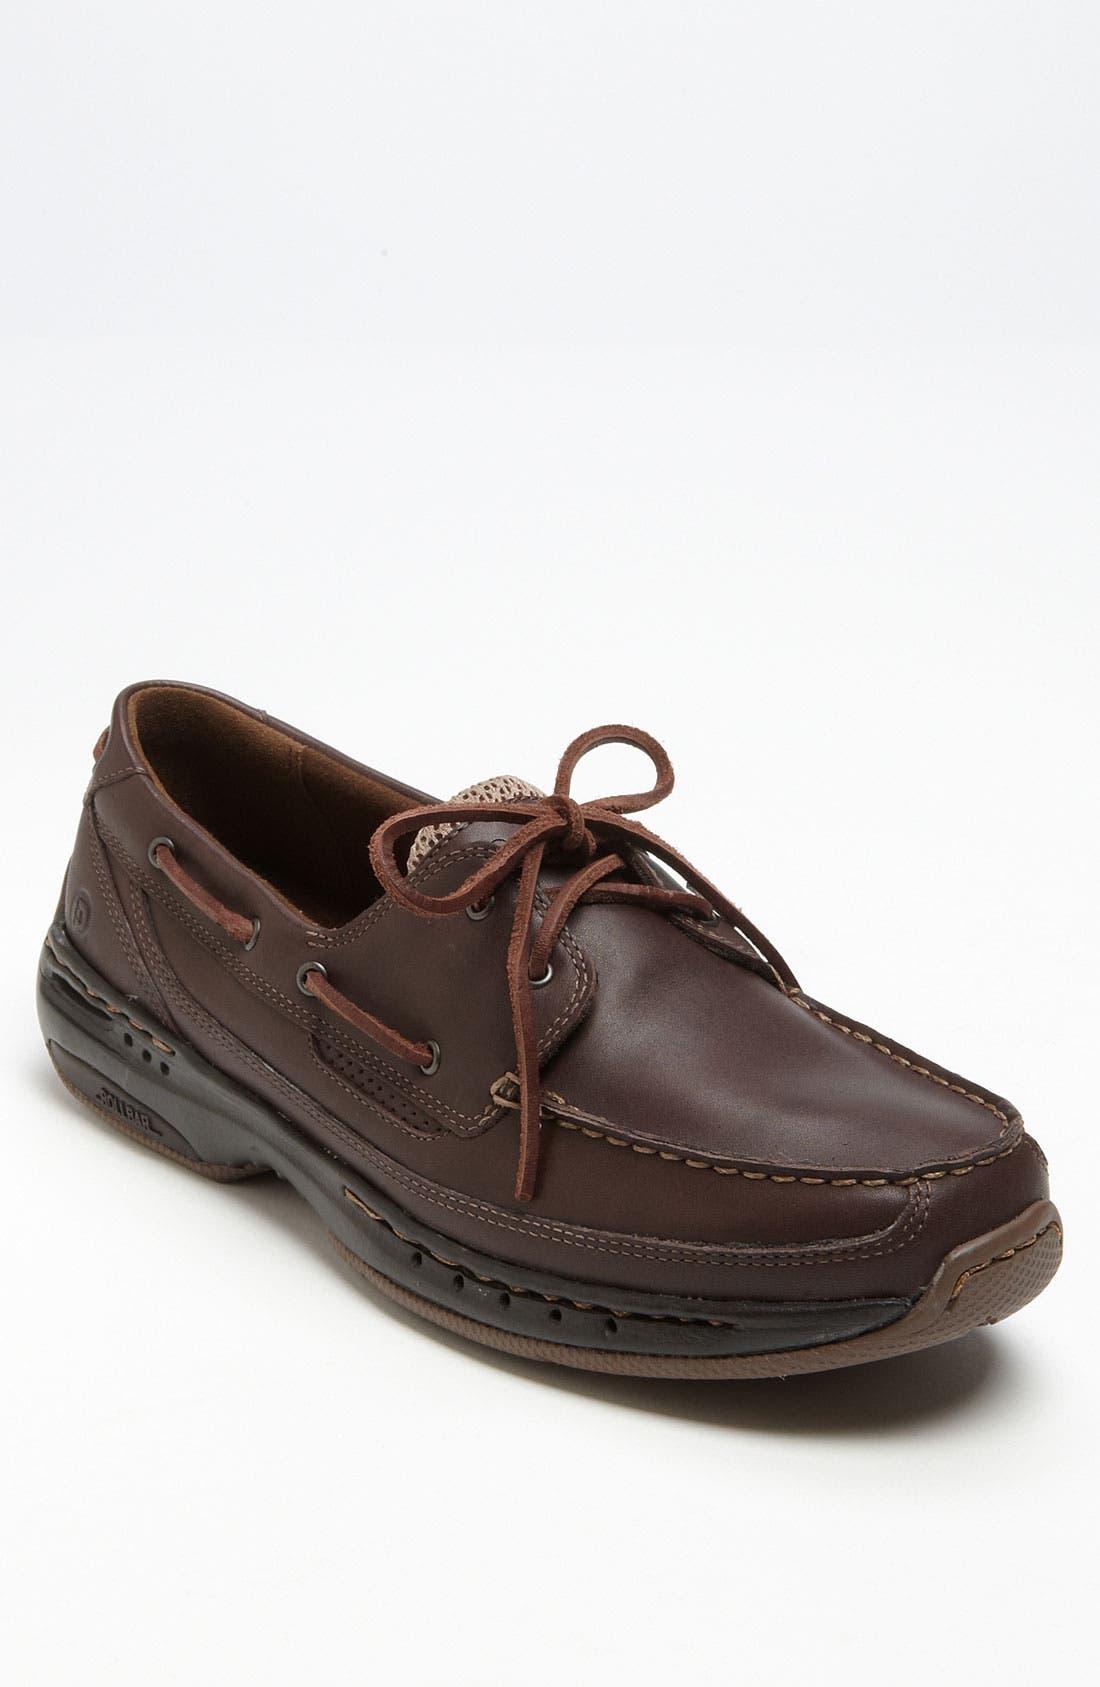 Main Image - Dunham 'Shoreline' Boat Shoe (Online Only)